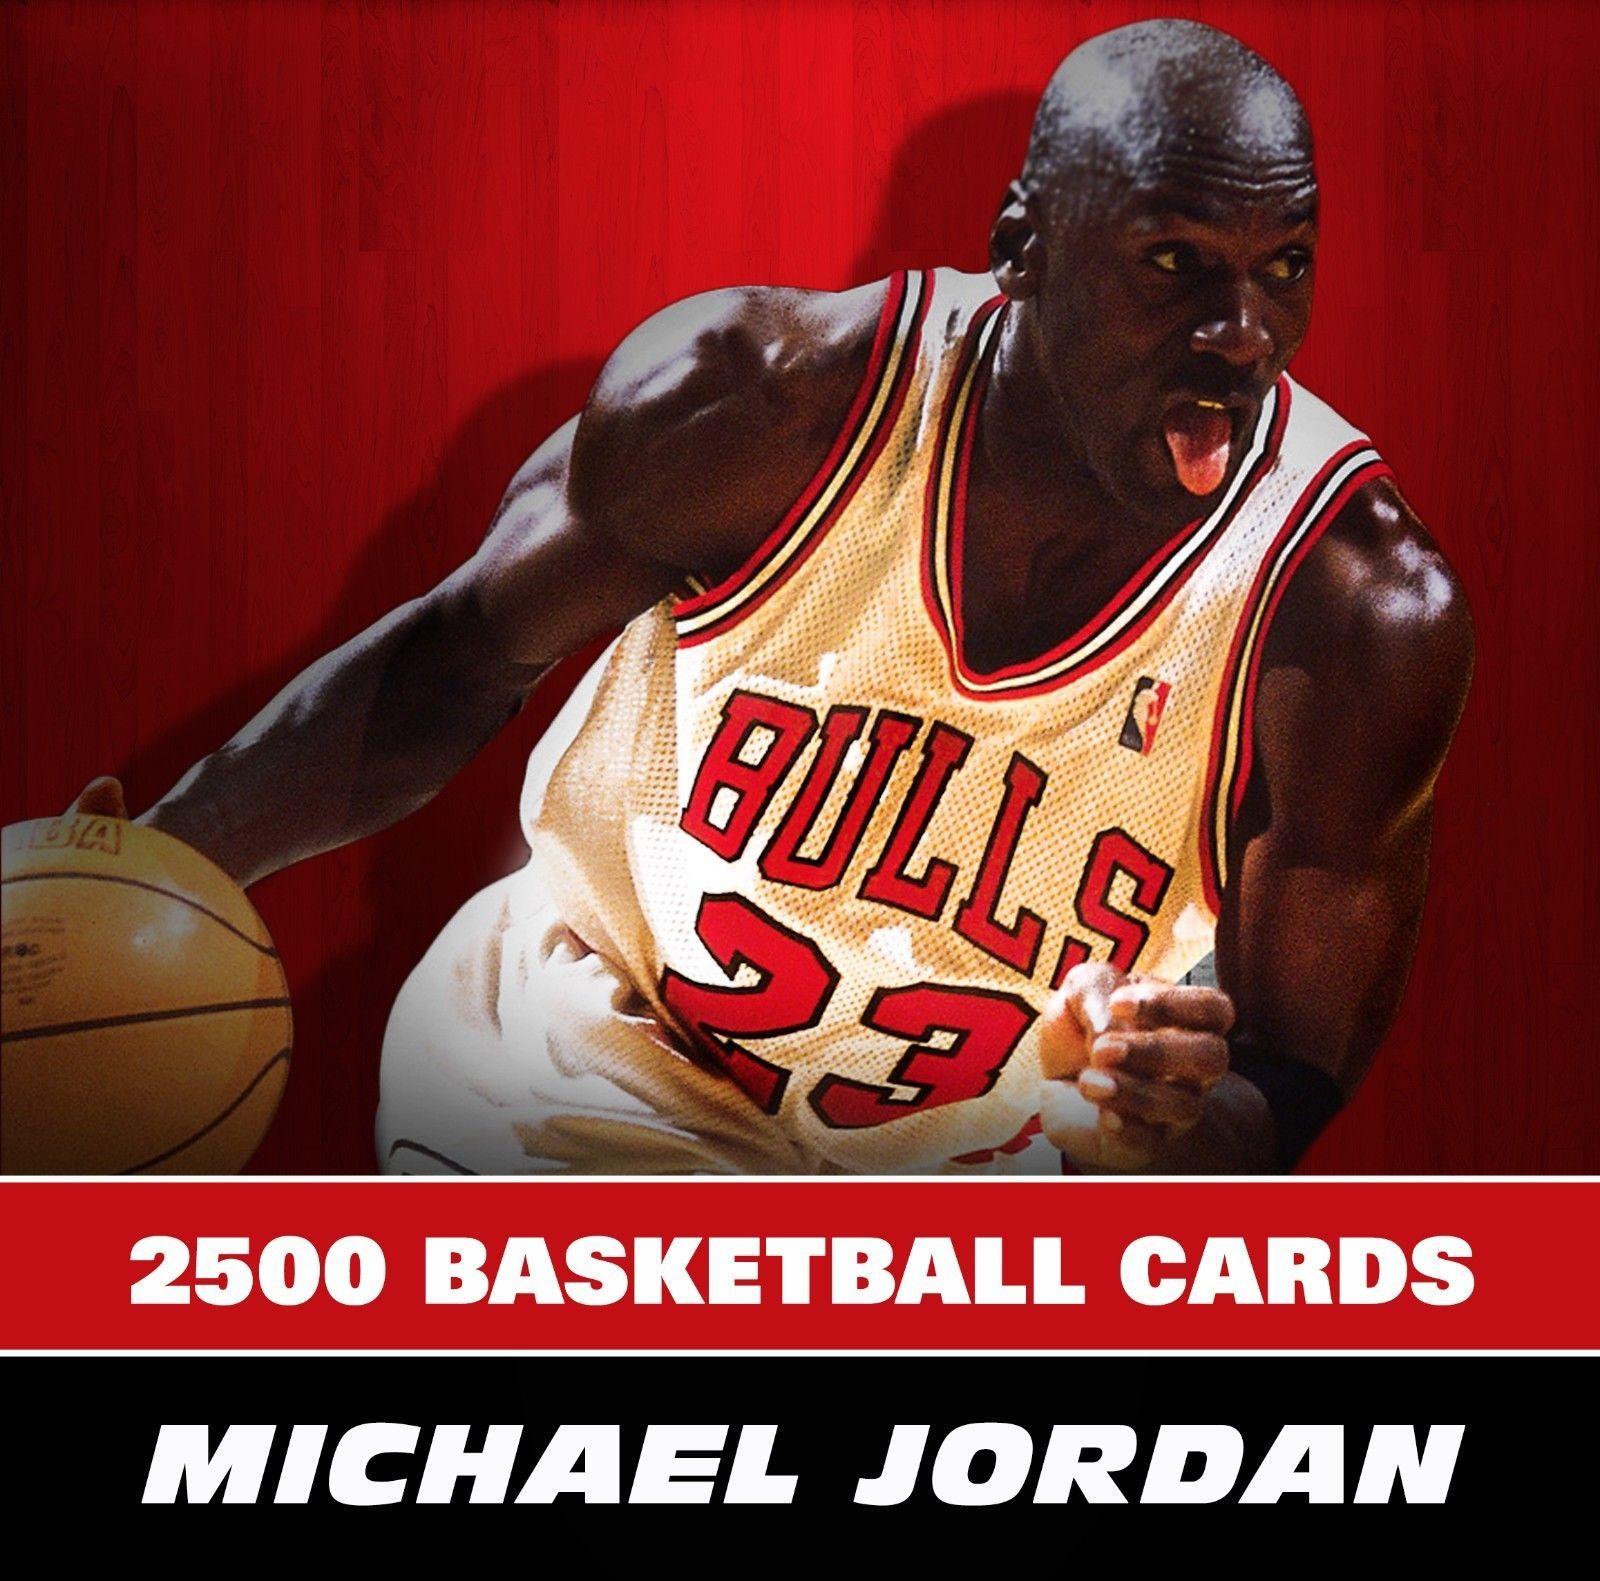 2500 Michael Jordan Huge Basketball Card Lot Collection Ebay Michael Jordan Basketball Cards Michael Jordan Basketball Cards